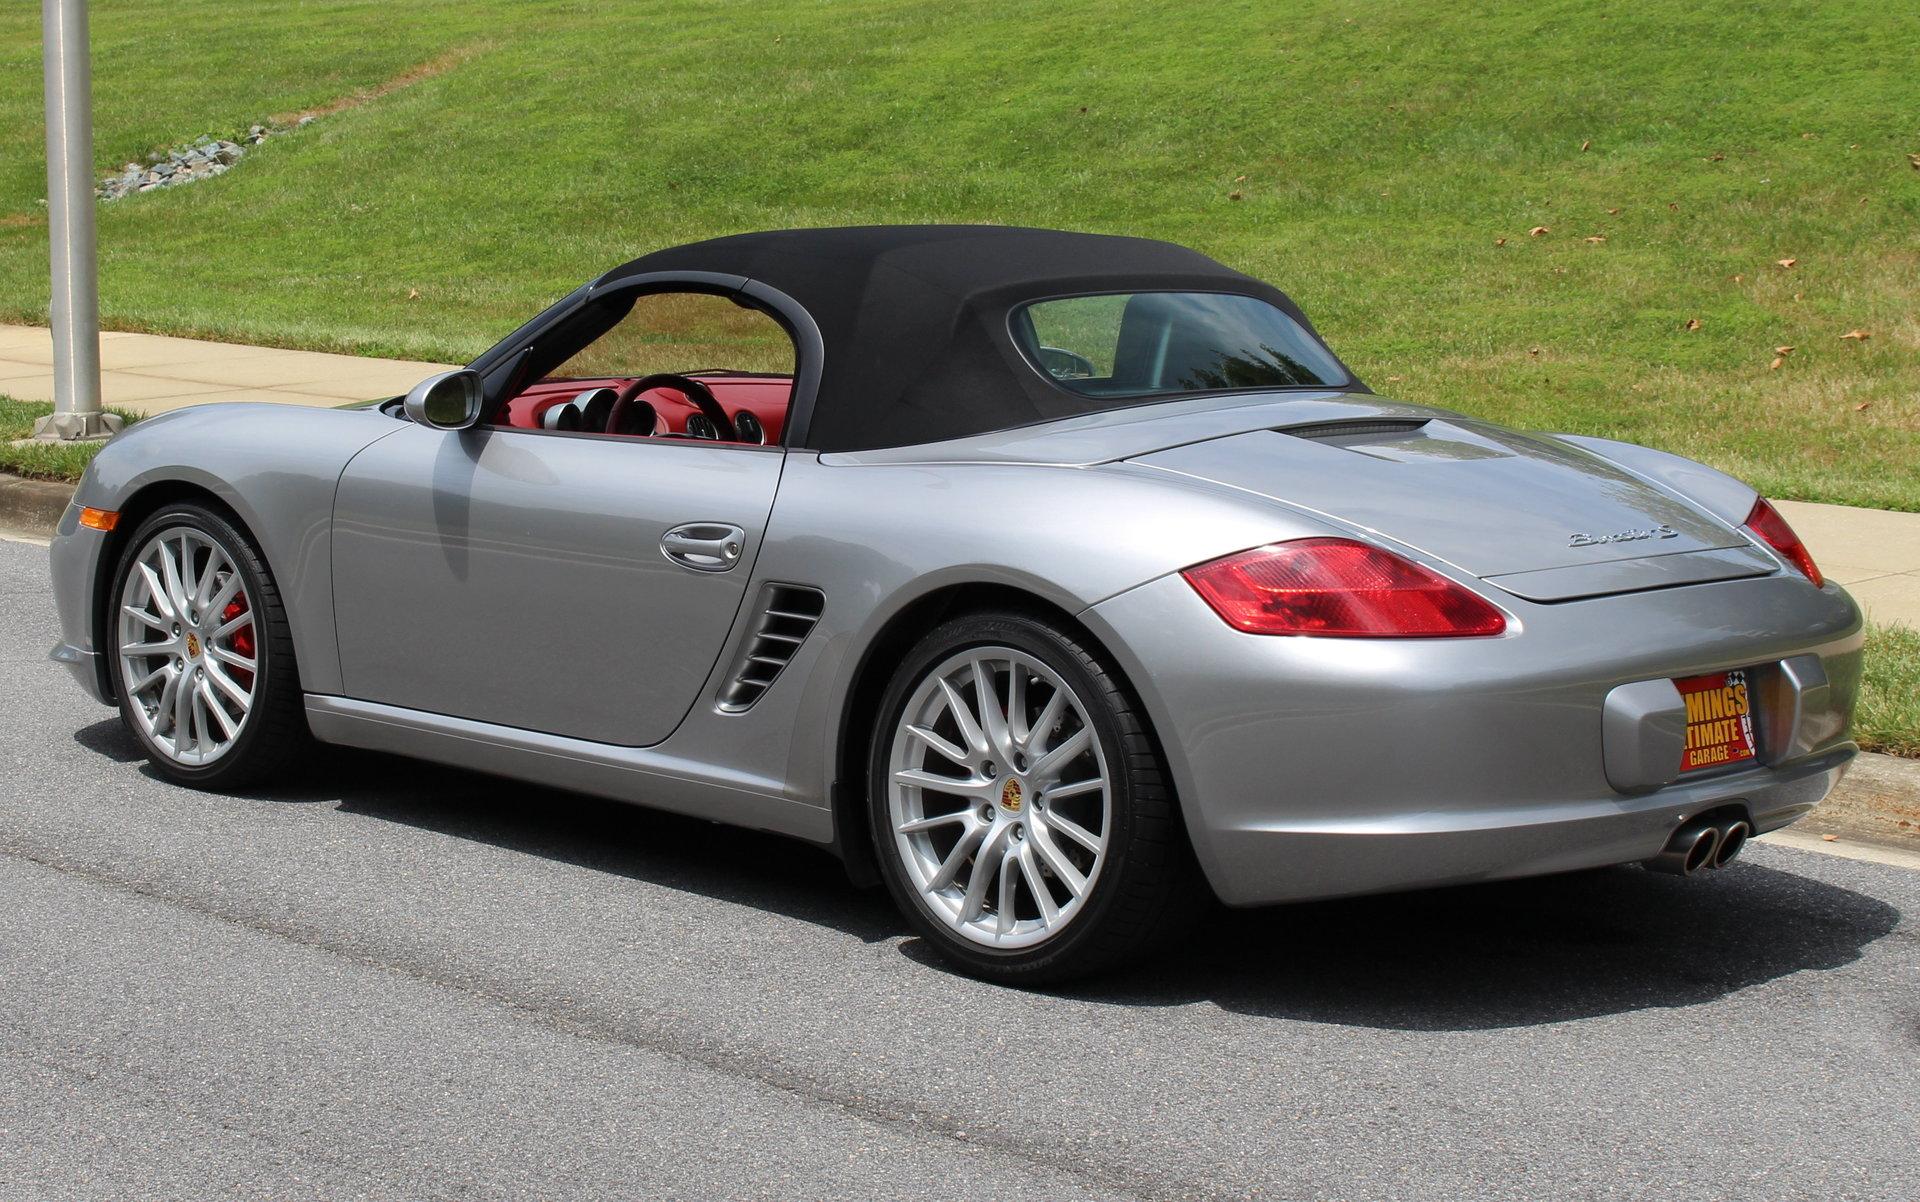 2008 Porsche Boxster Rs60 Spyder For Sale 94622 Mcg